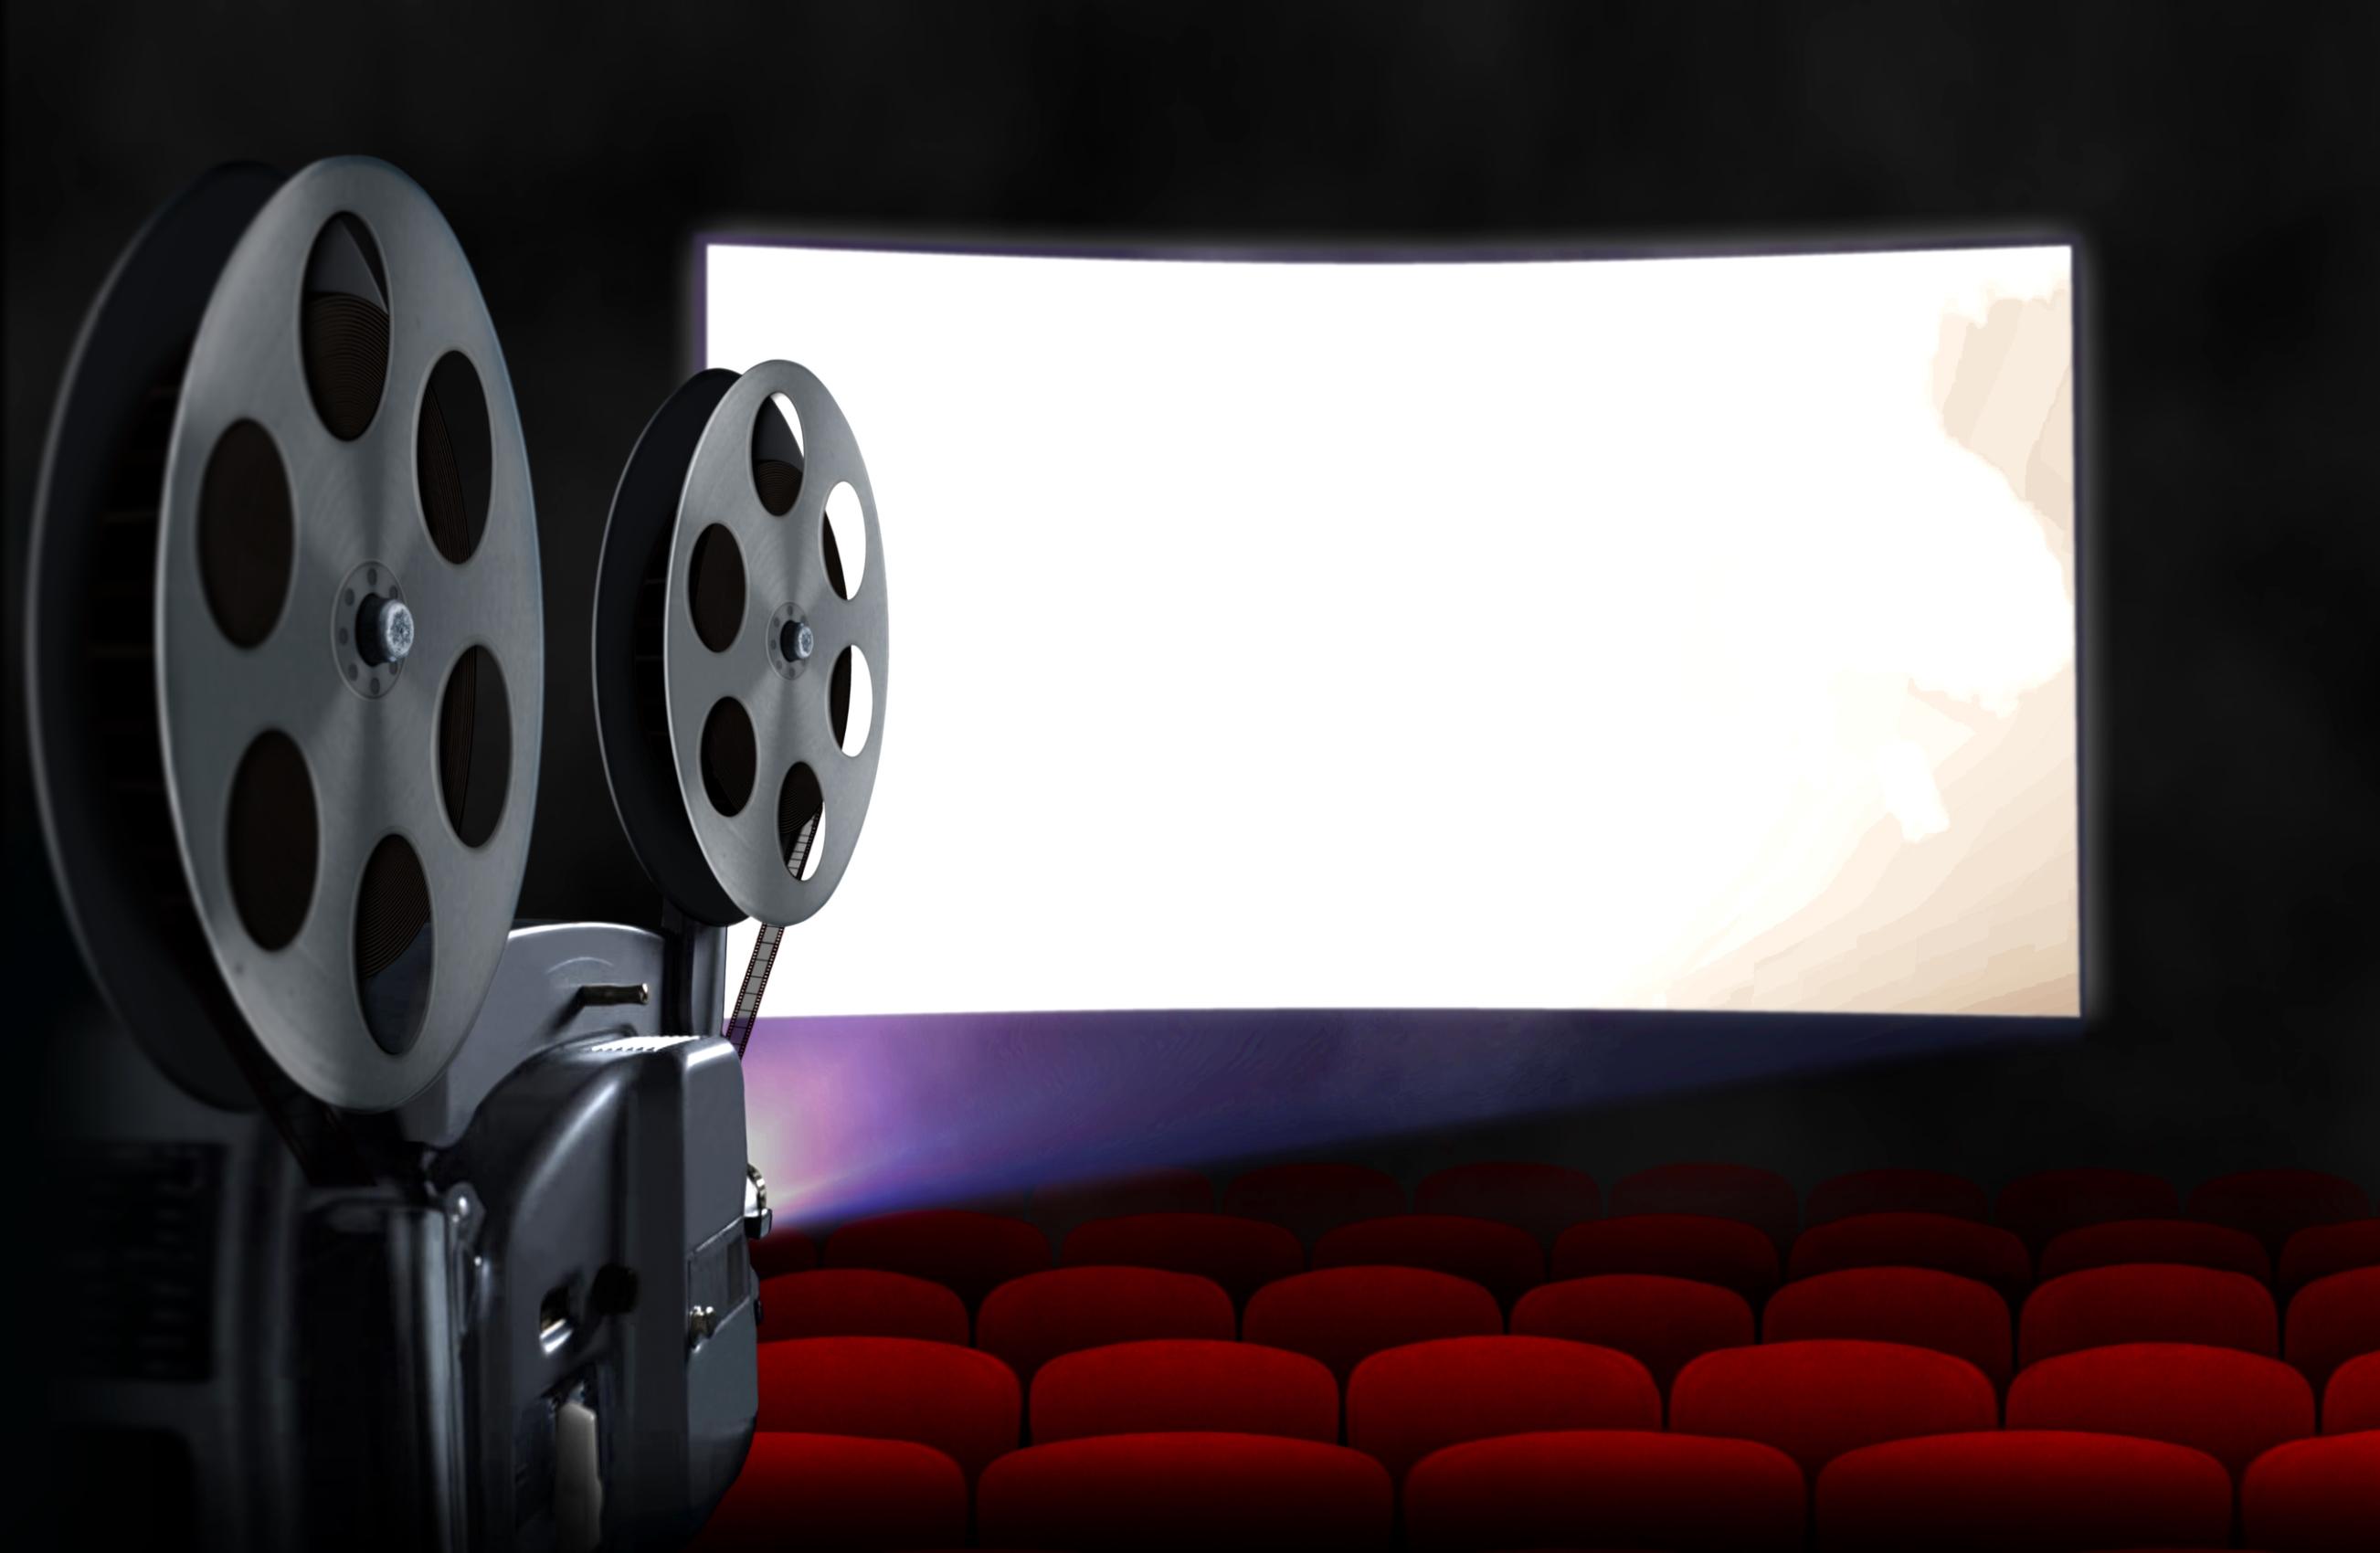 Movie theatre sign of knee